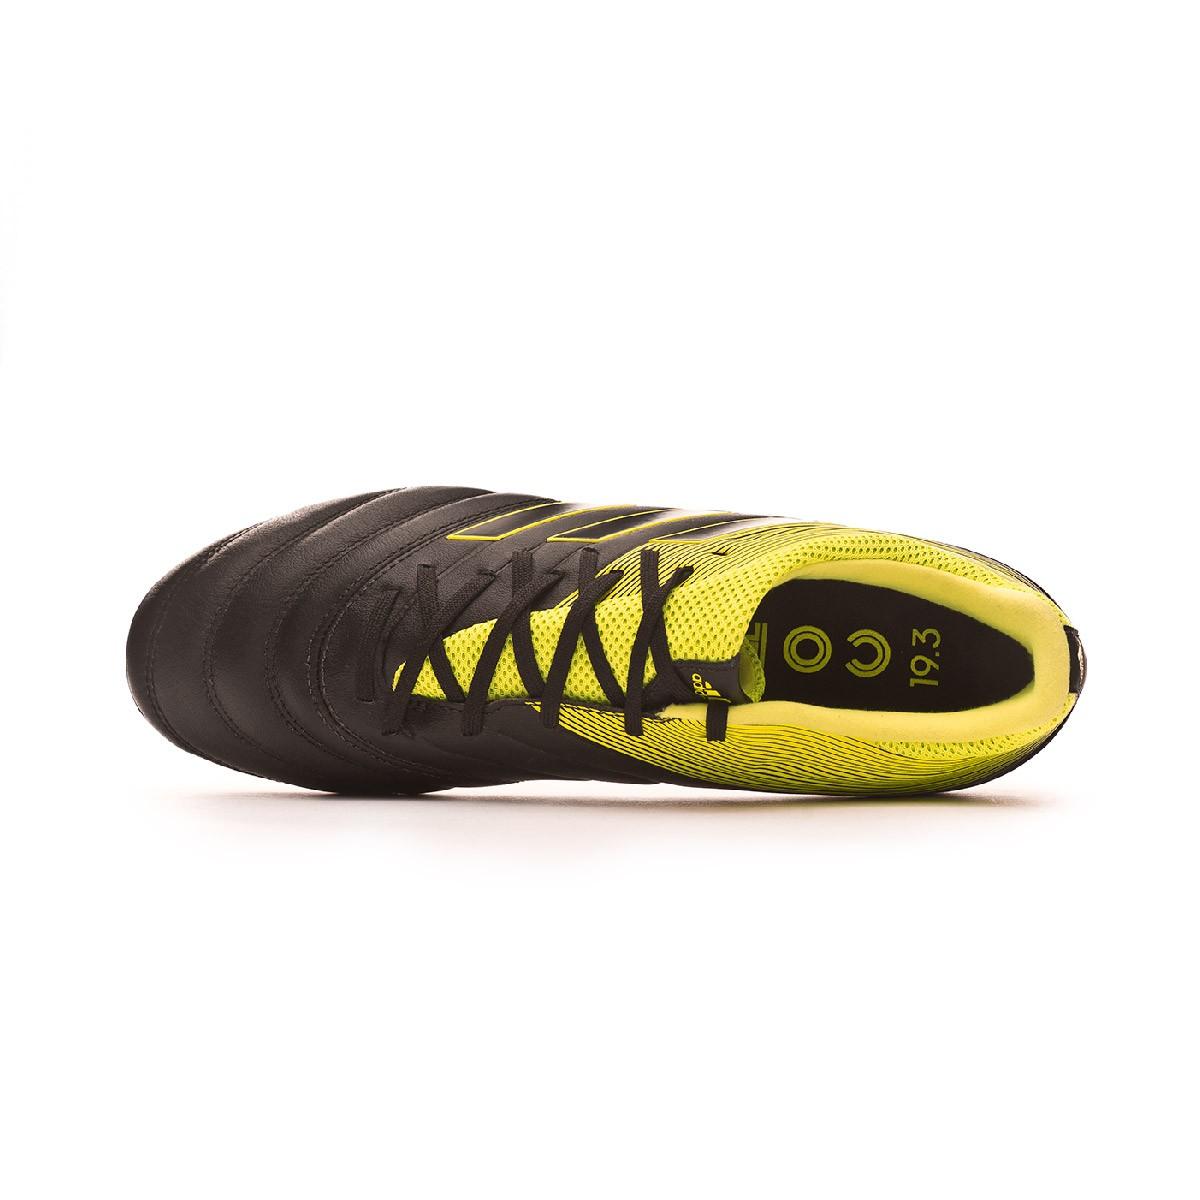 8084132b96f6e Zapatos de fútbol adidas Copa 19.3 AG Core black-Solar yellow-Core black -  Tienda de fútbol Fútbol Emotion